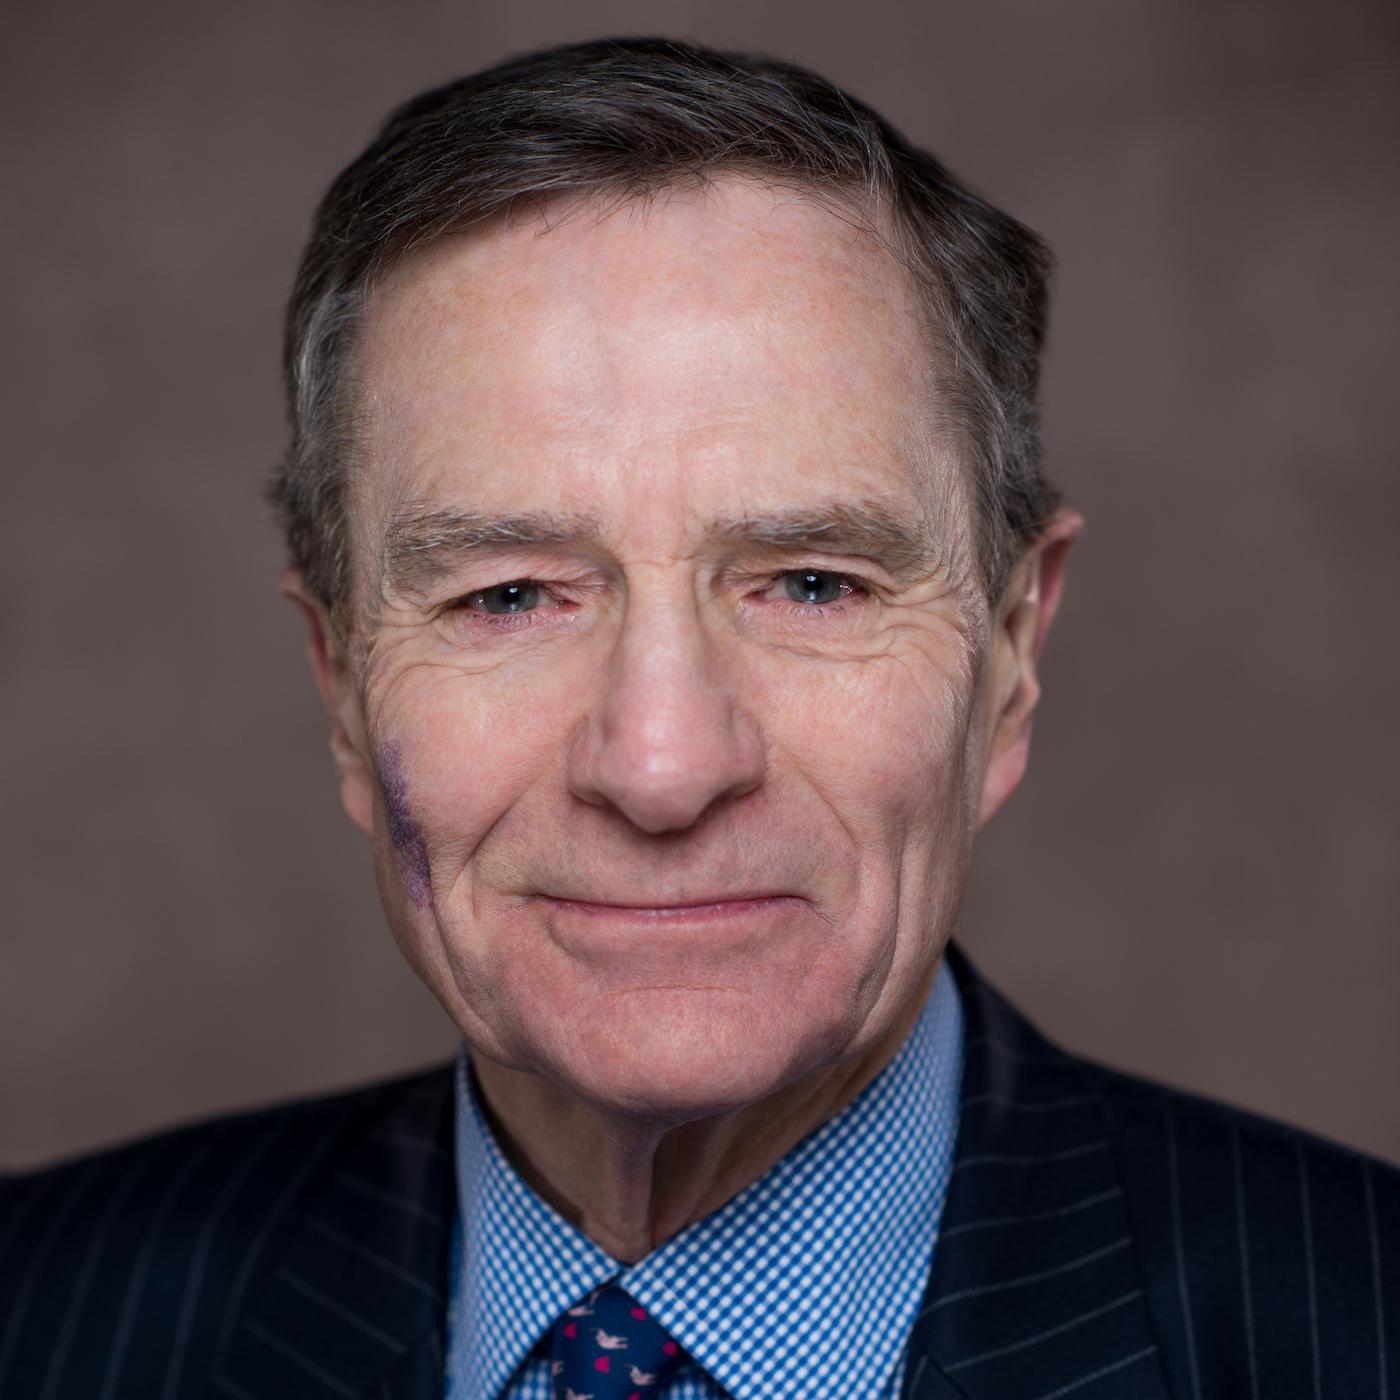 Photo of General Sir John McColl KCB CBE DSO